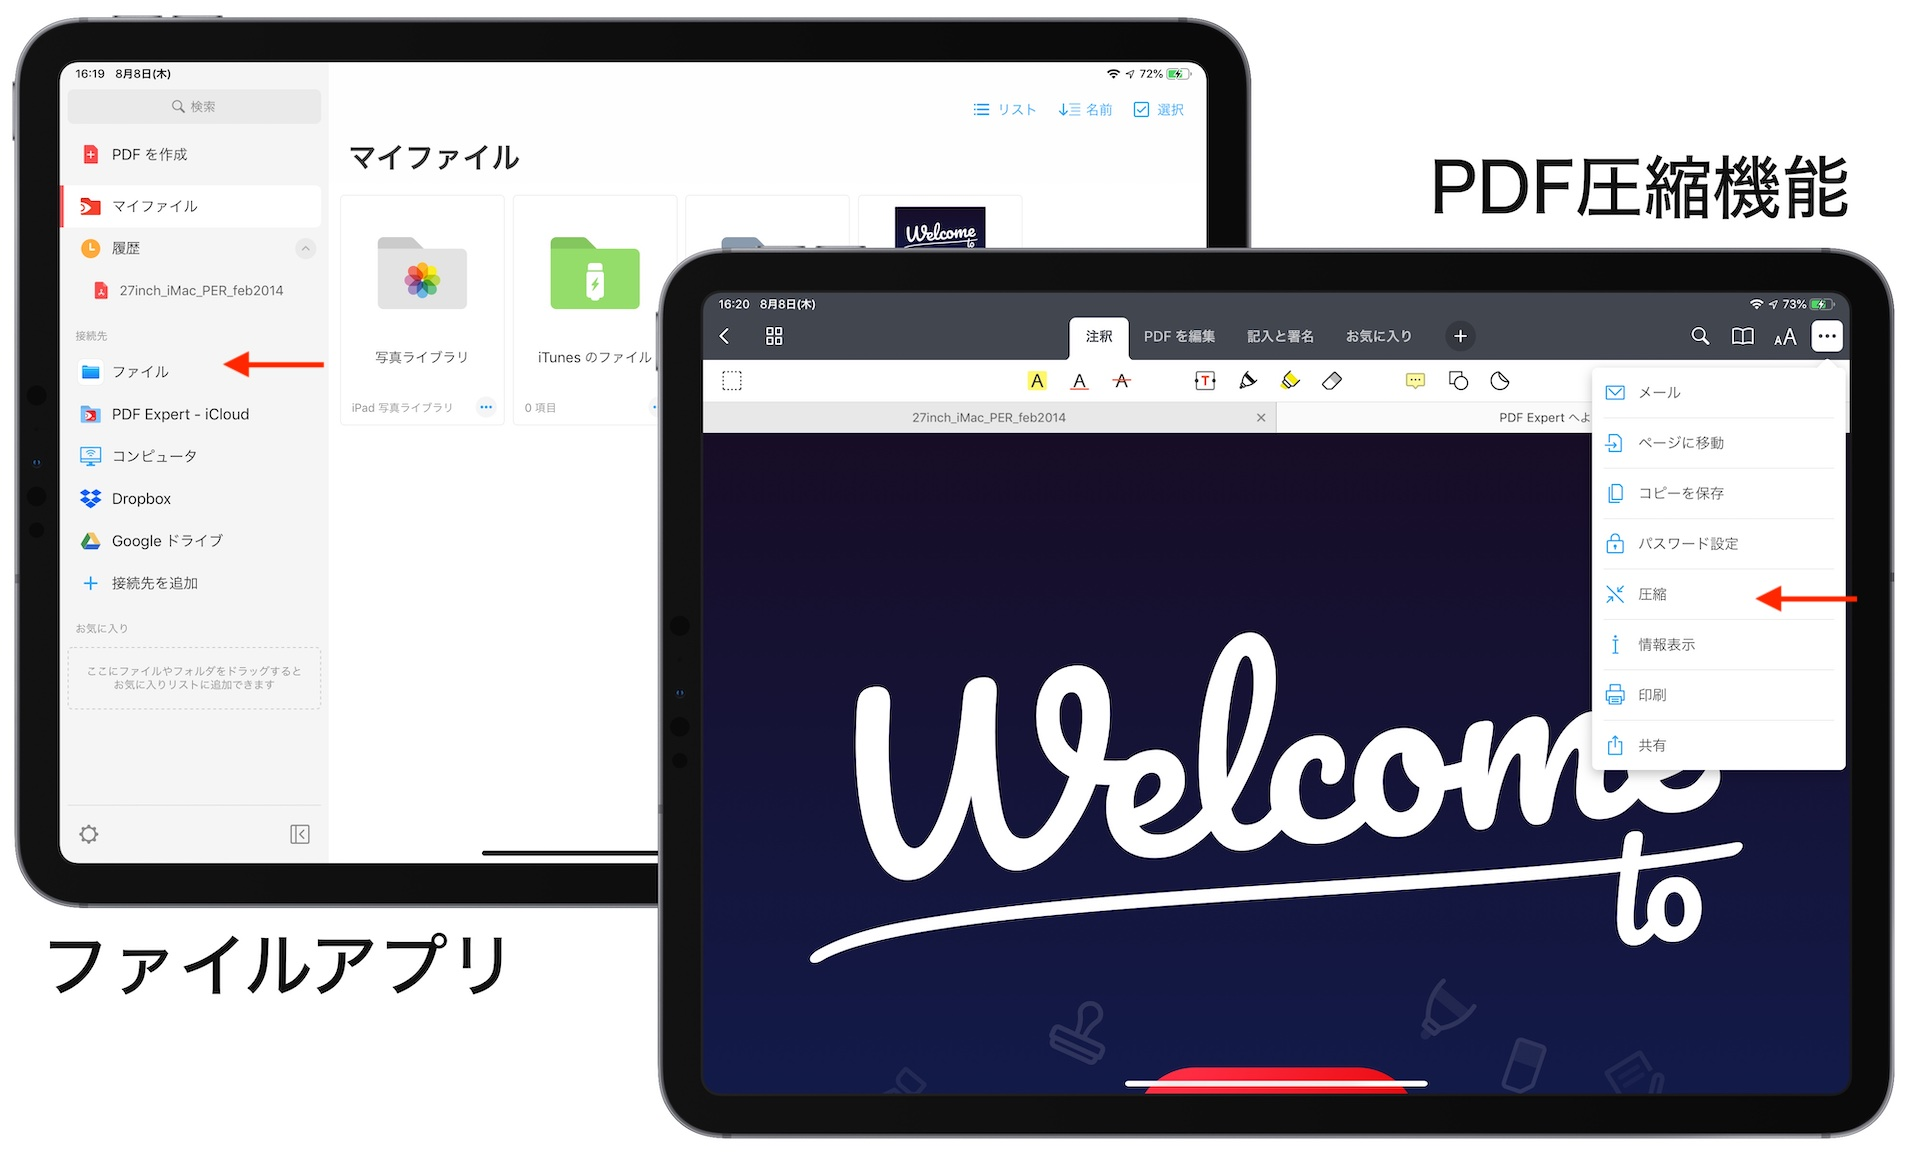 PDF編集:PDF Expert 7 - App Store